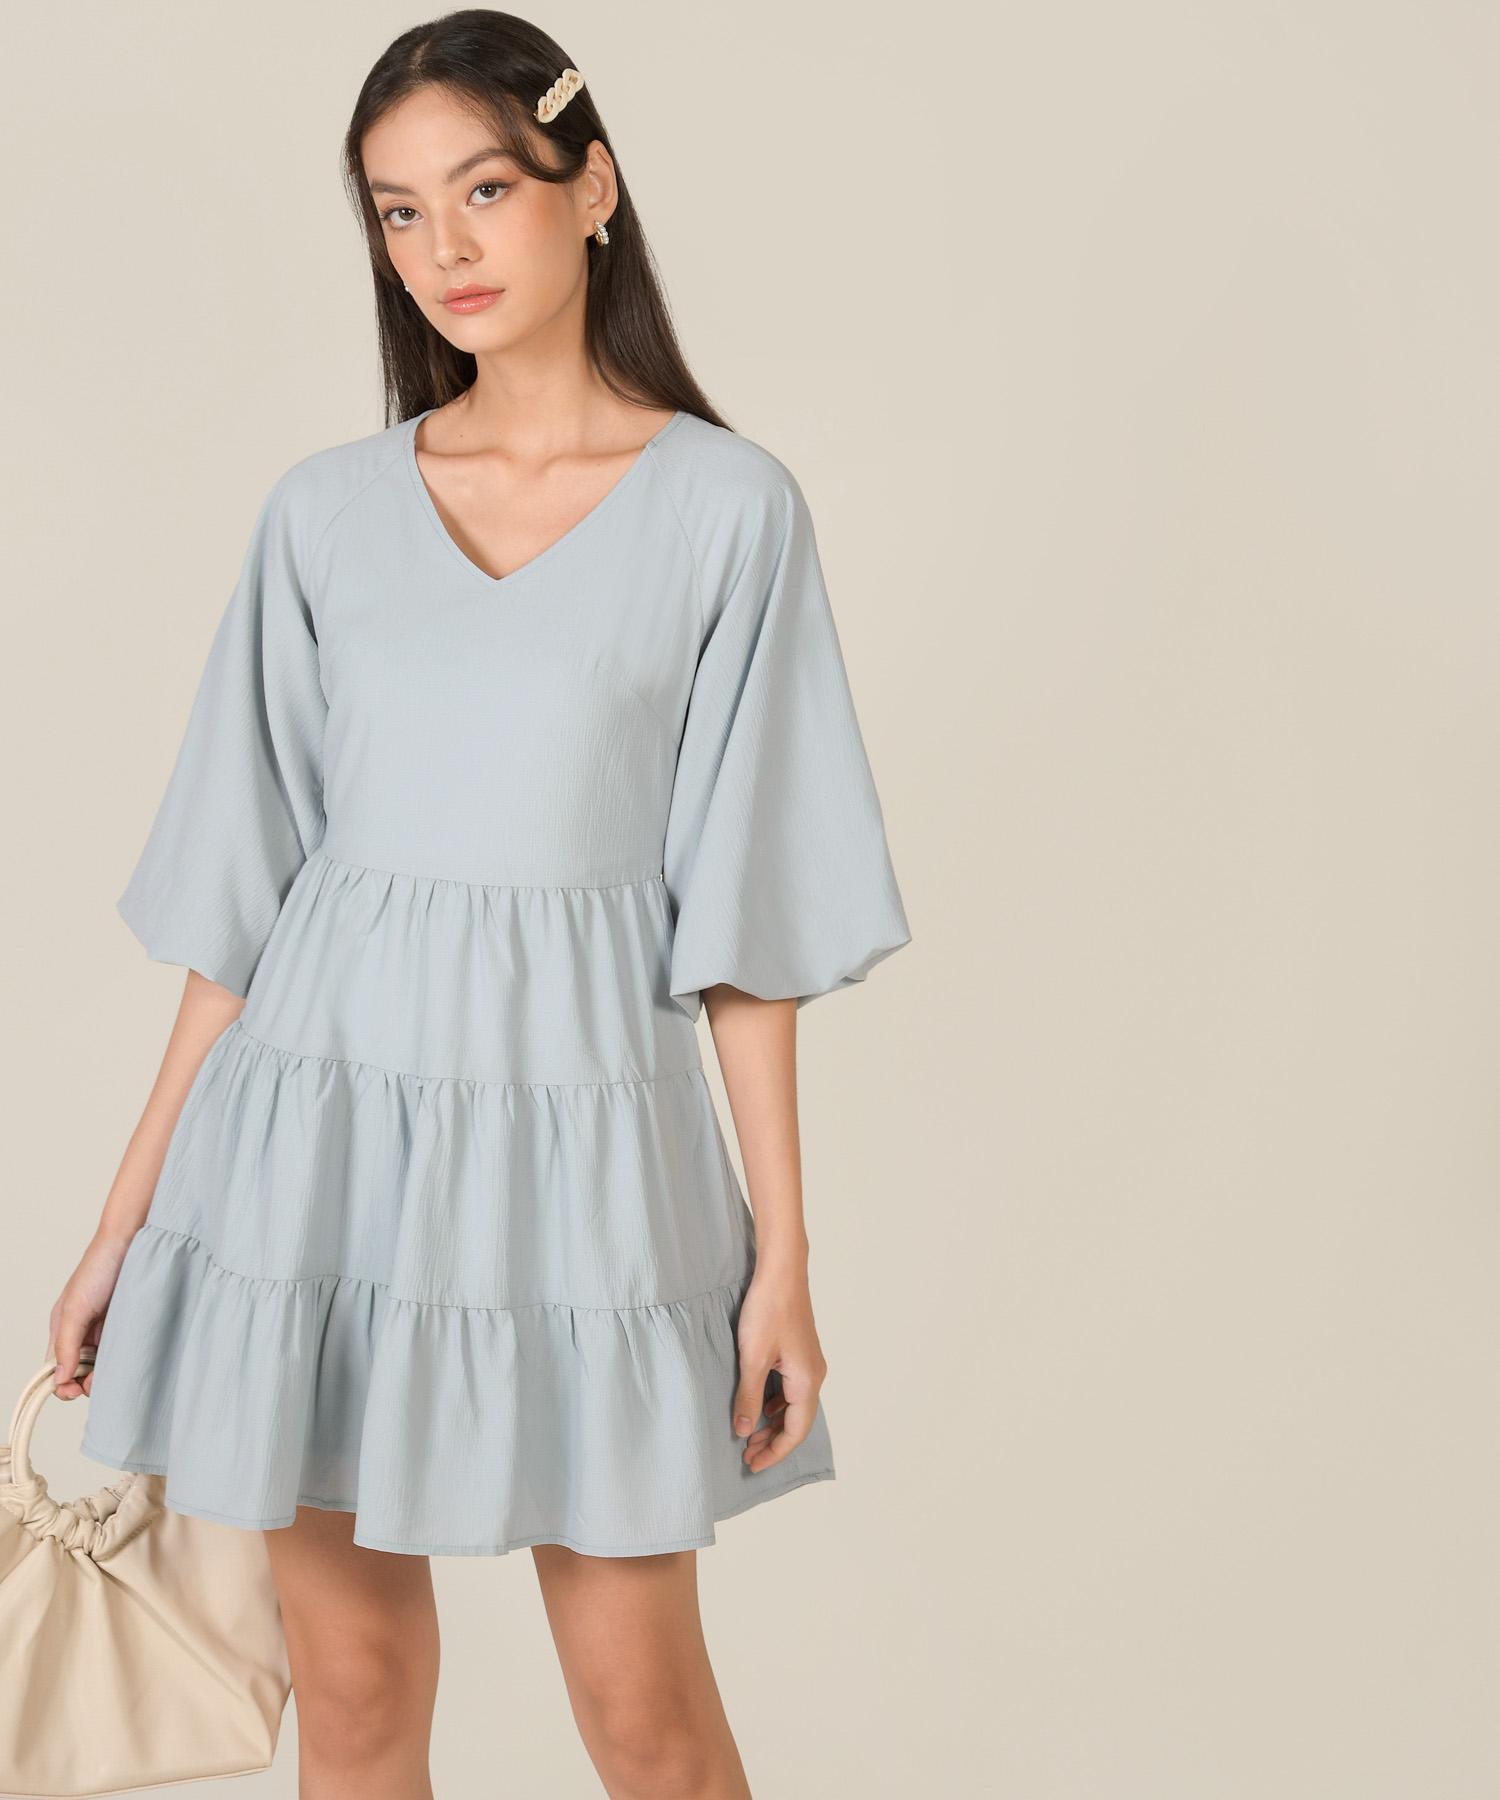 bellina-puff-sleeve-tiered-dress-mist-blue-1